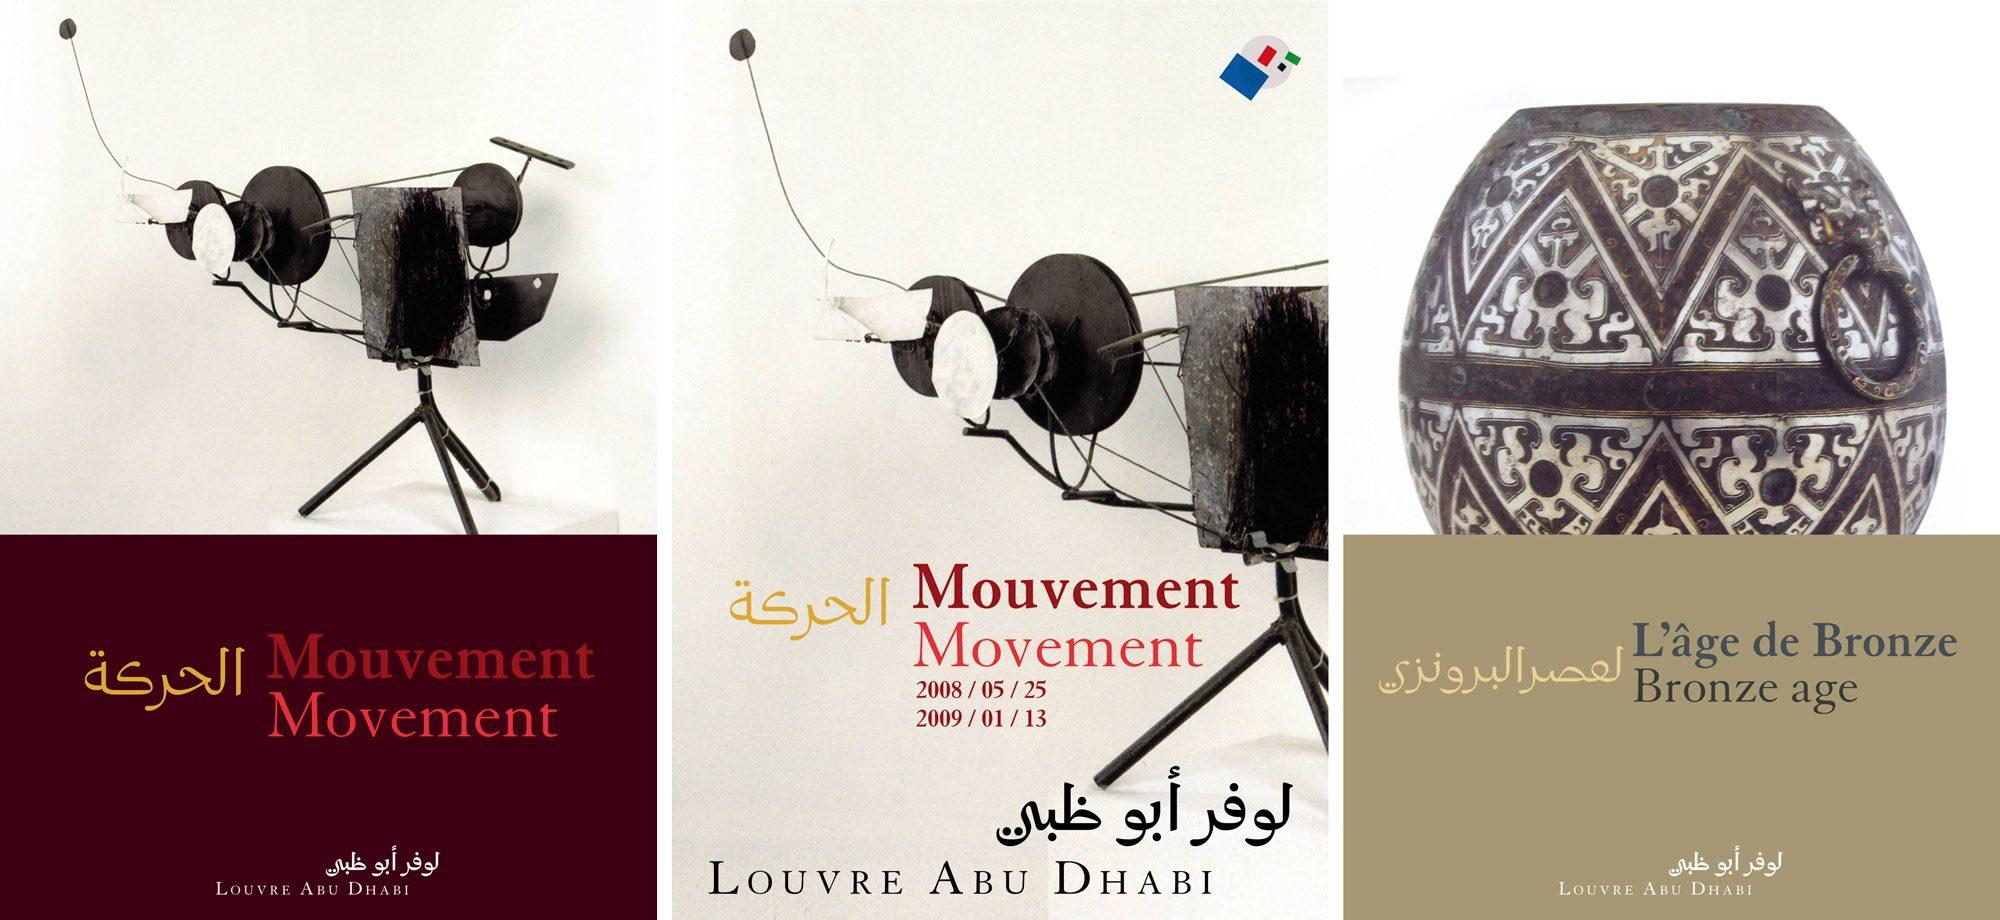 affiches du Louvre Abu Dhabi par Ichetkar